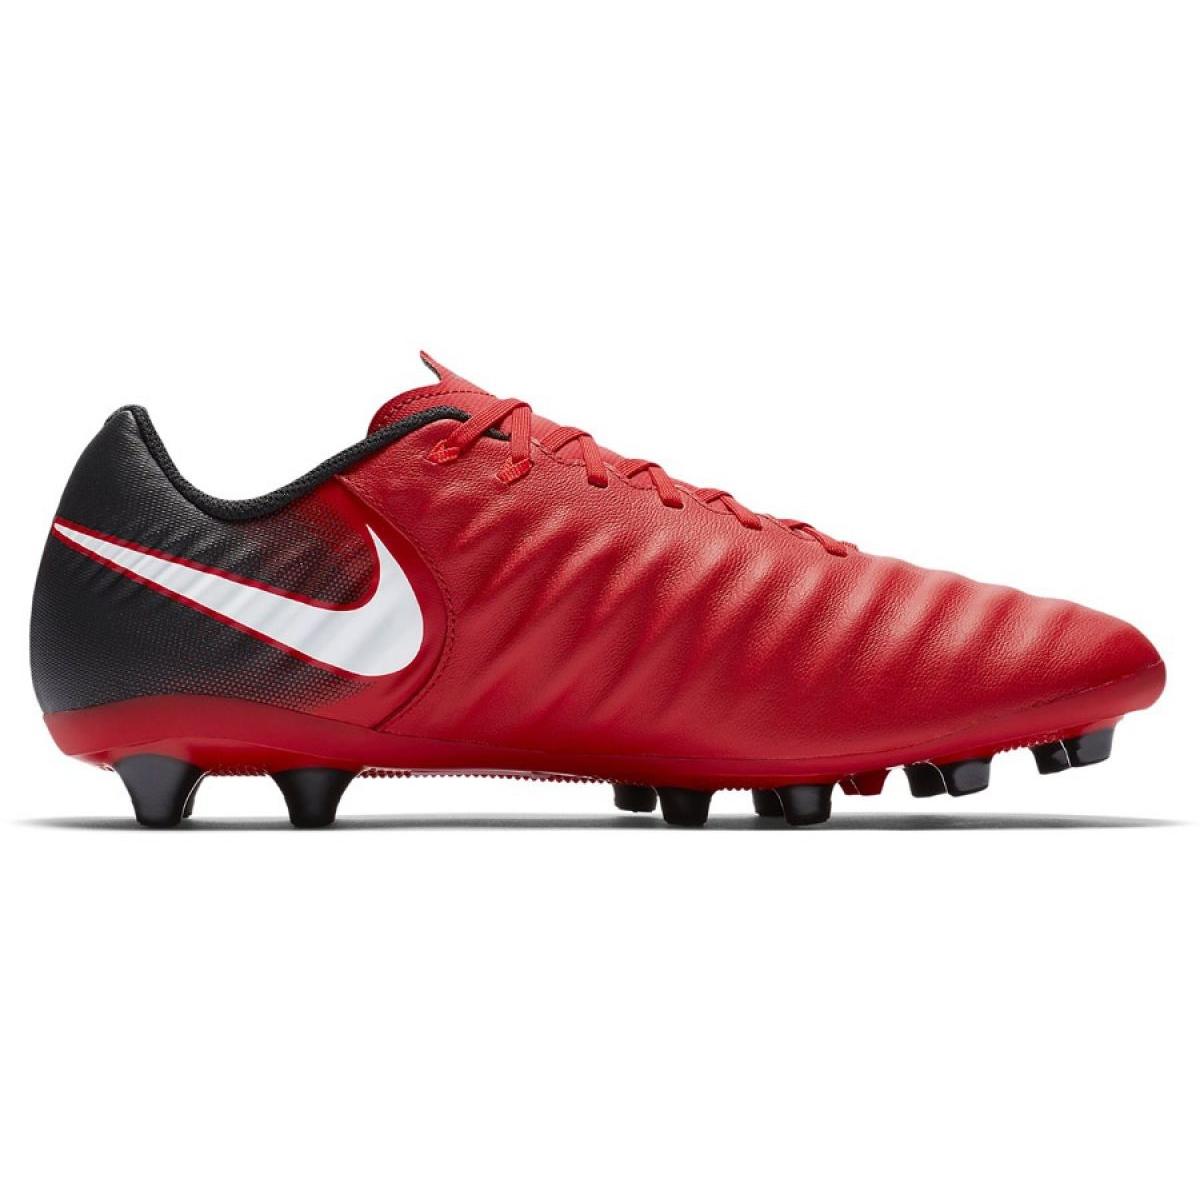 Benigno escaldadura Ventilar  Football shoes Nike Tiempo Ligera Iv Ag Pro M 897743-616 red red -  ButyModne.pl